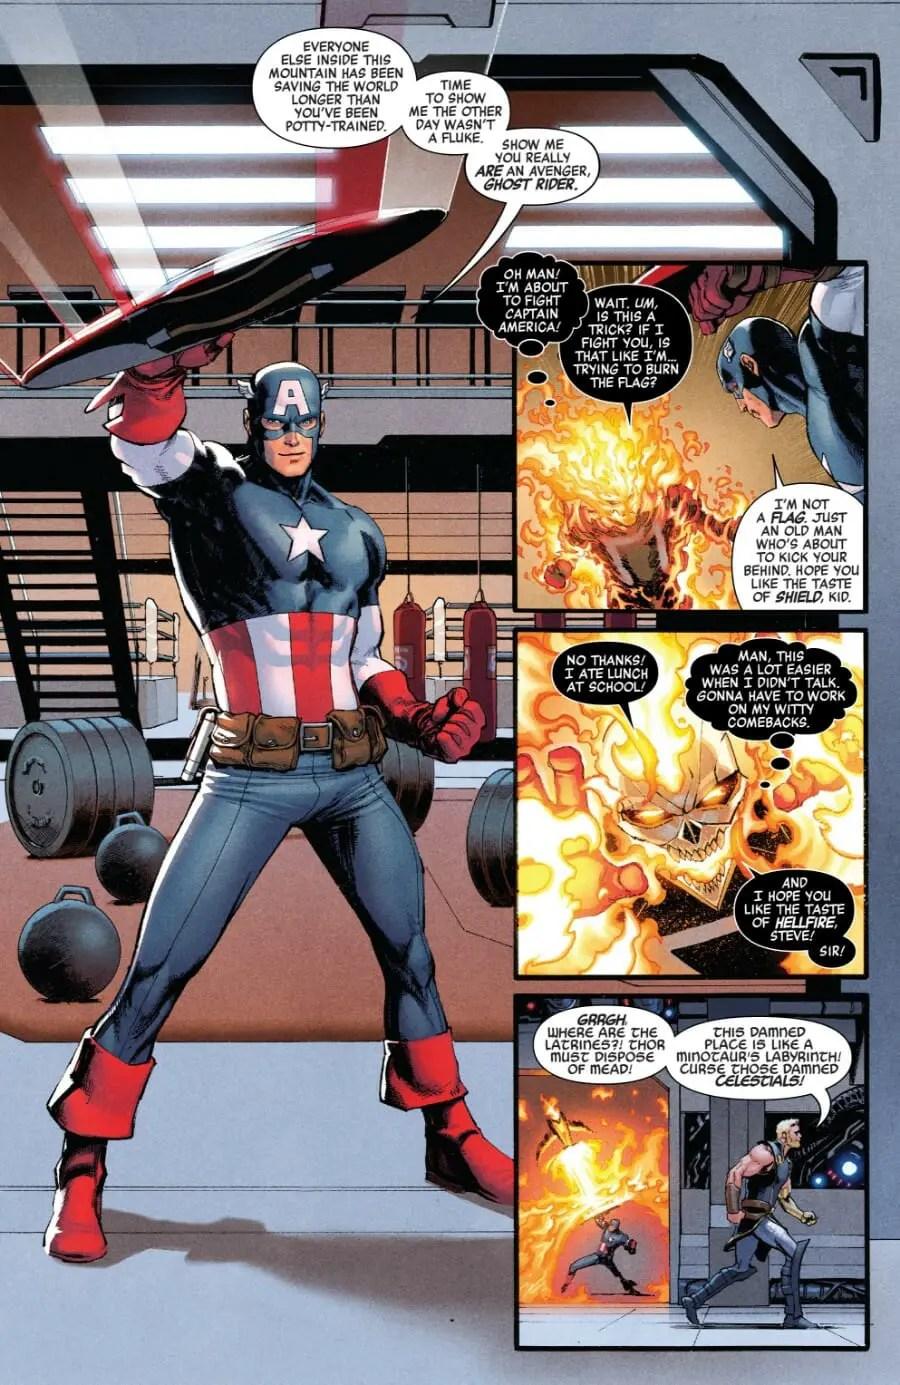 Avengers #8 Review - Comic Book Revolution